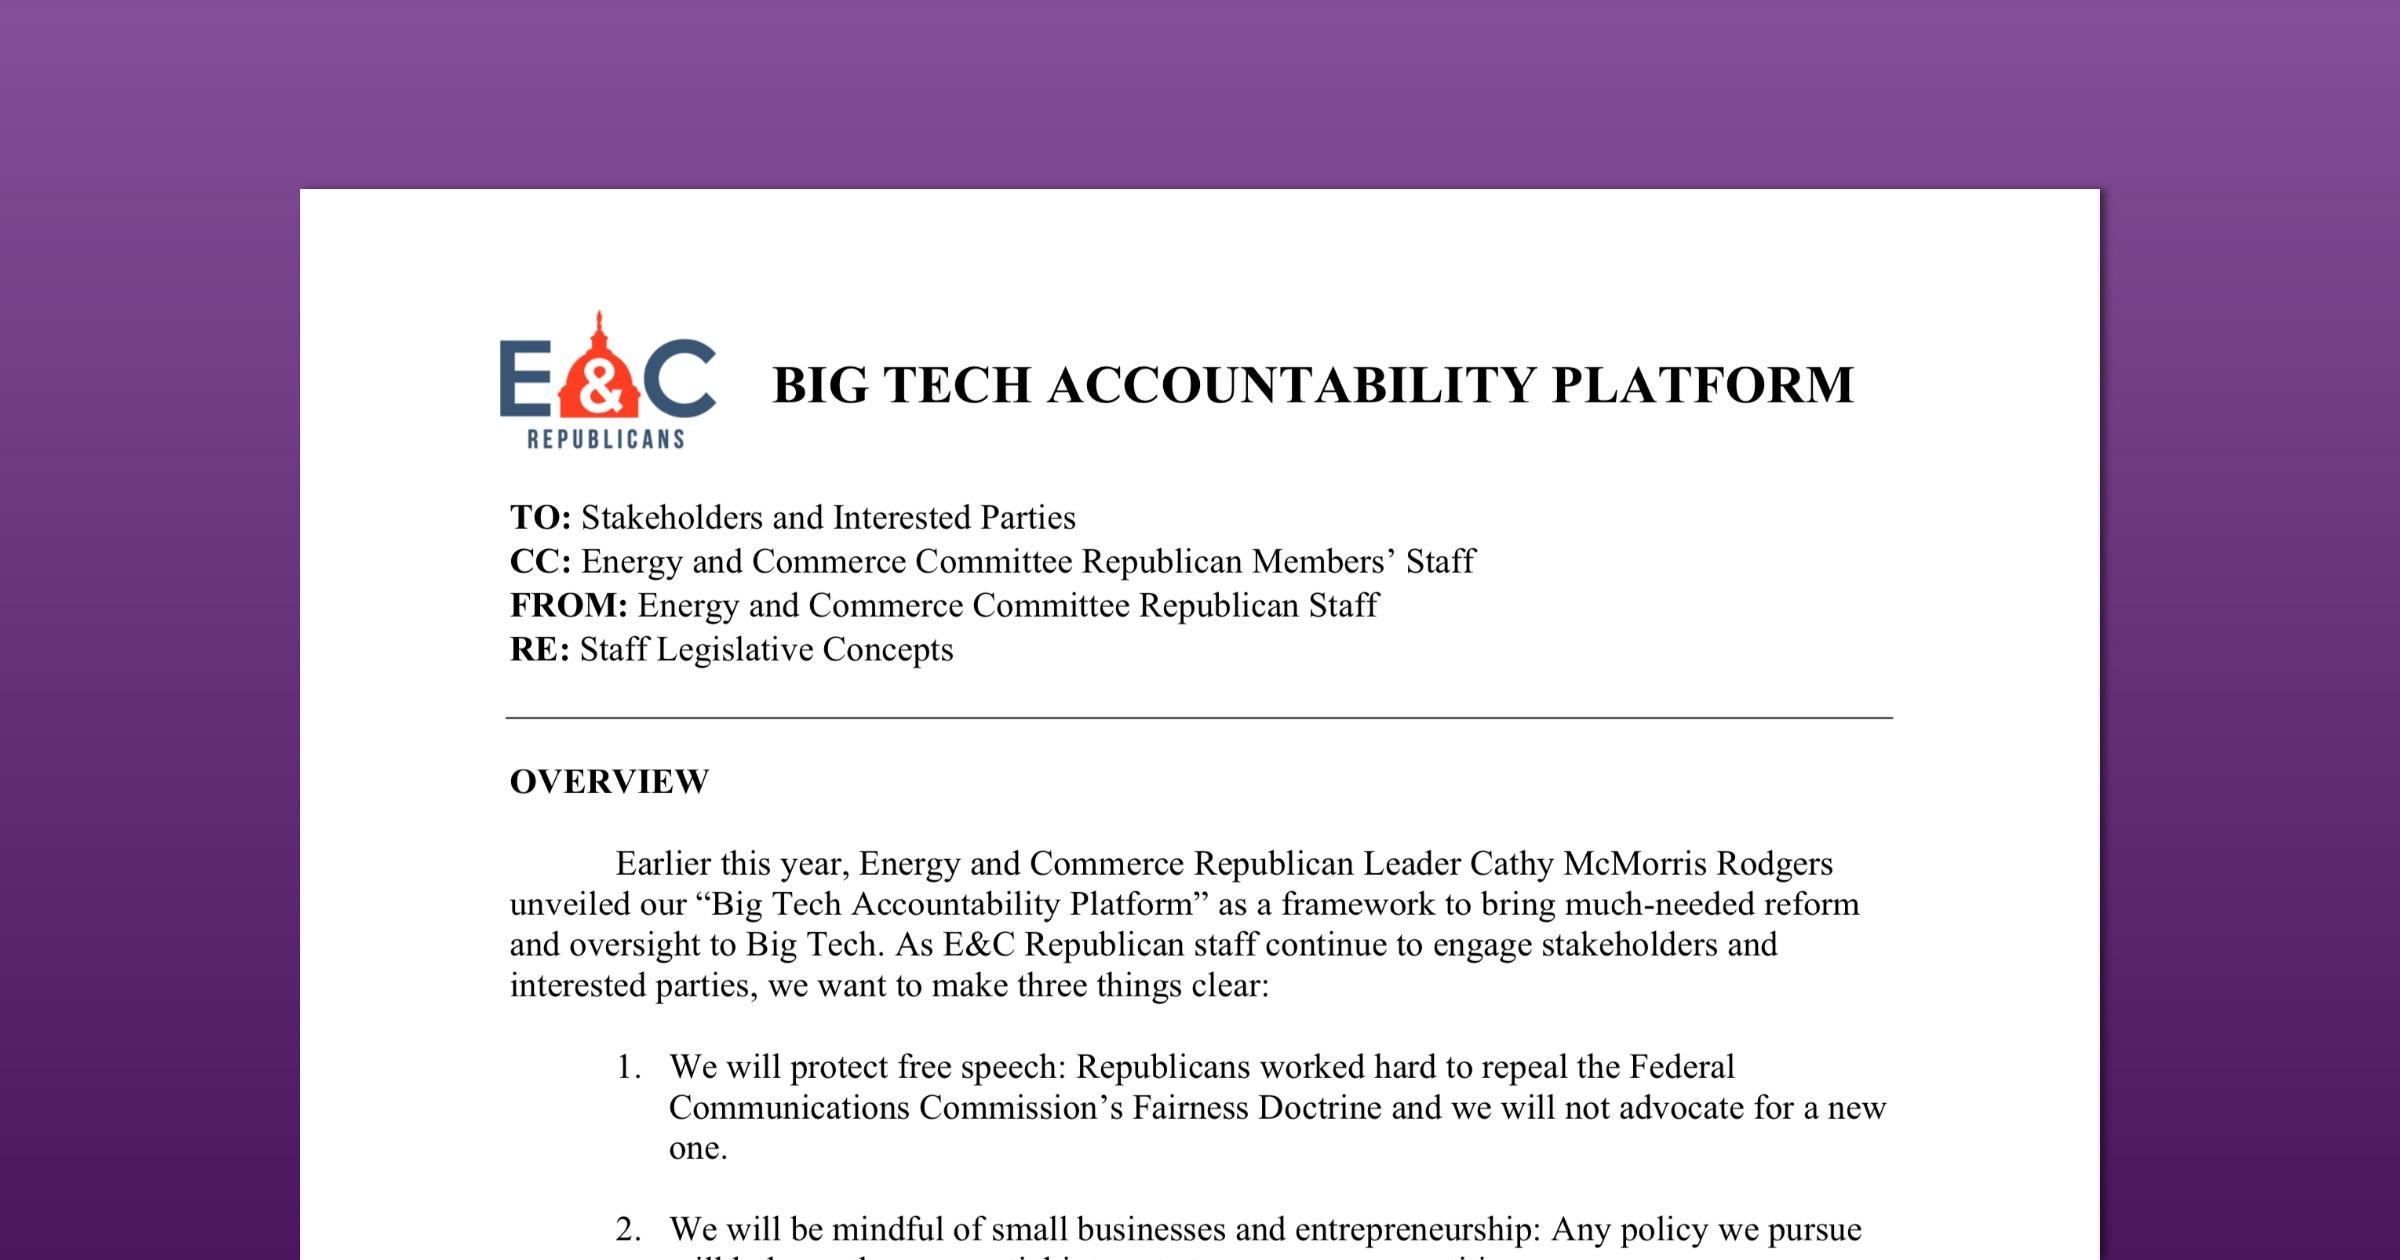 Big tech accountability platform